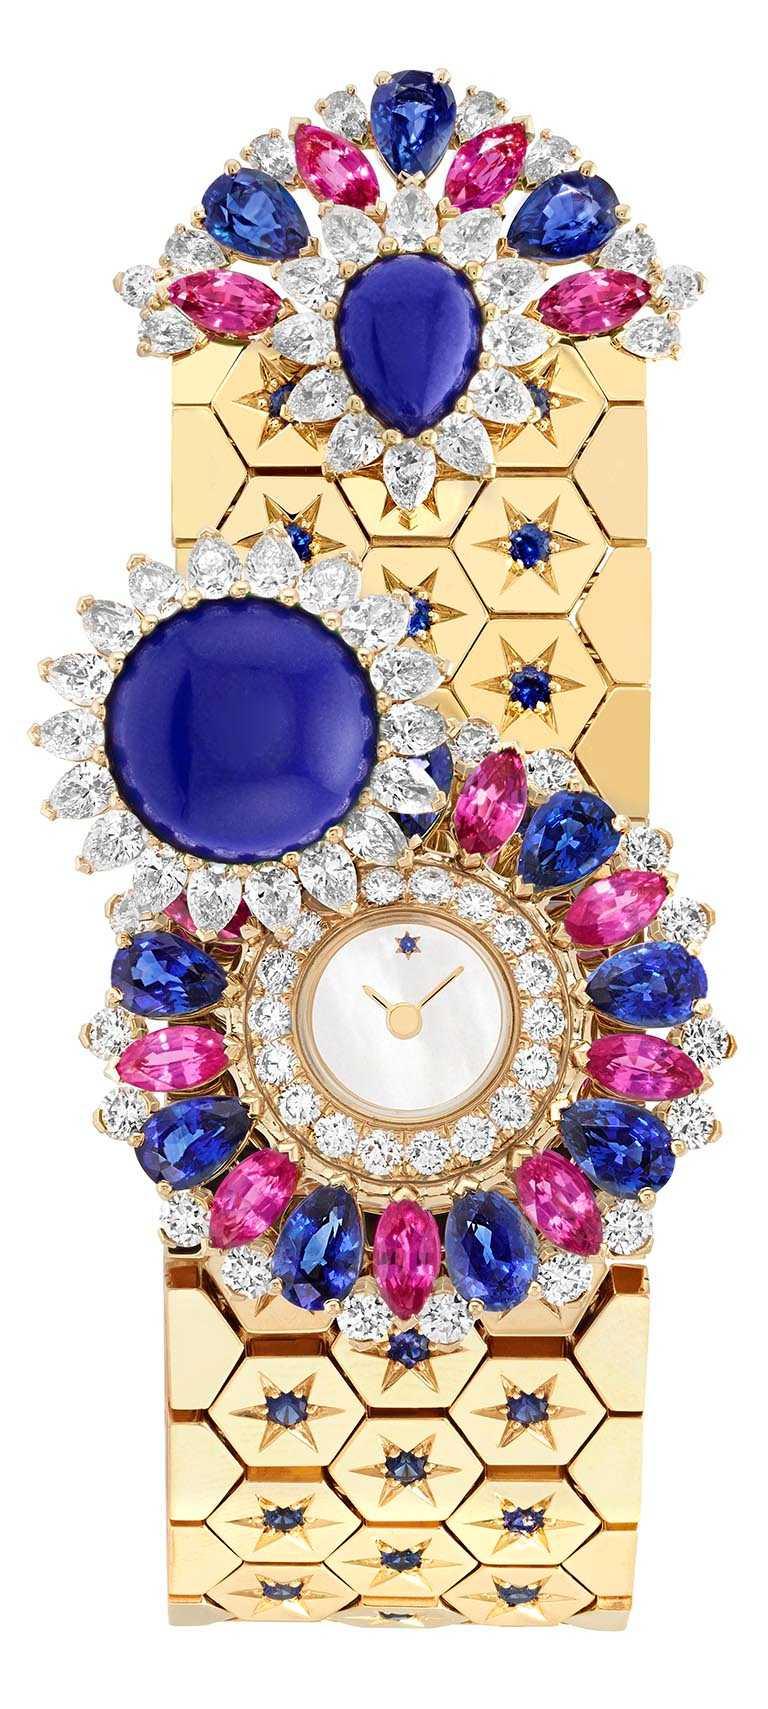 Van Cleef & Arpels「Rose de Noël」系列「Ludo Secret」腕錶,黃K金錶殼、錶帶,石英機芯,藍色及粉紅色藍寶石、青金石、白色珍珠母貝、鑽石╱7,300,000元。(圖╱Van Cleef & Arpels提供)